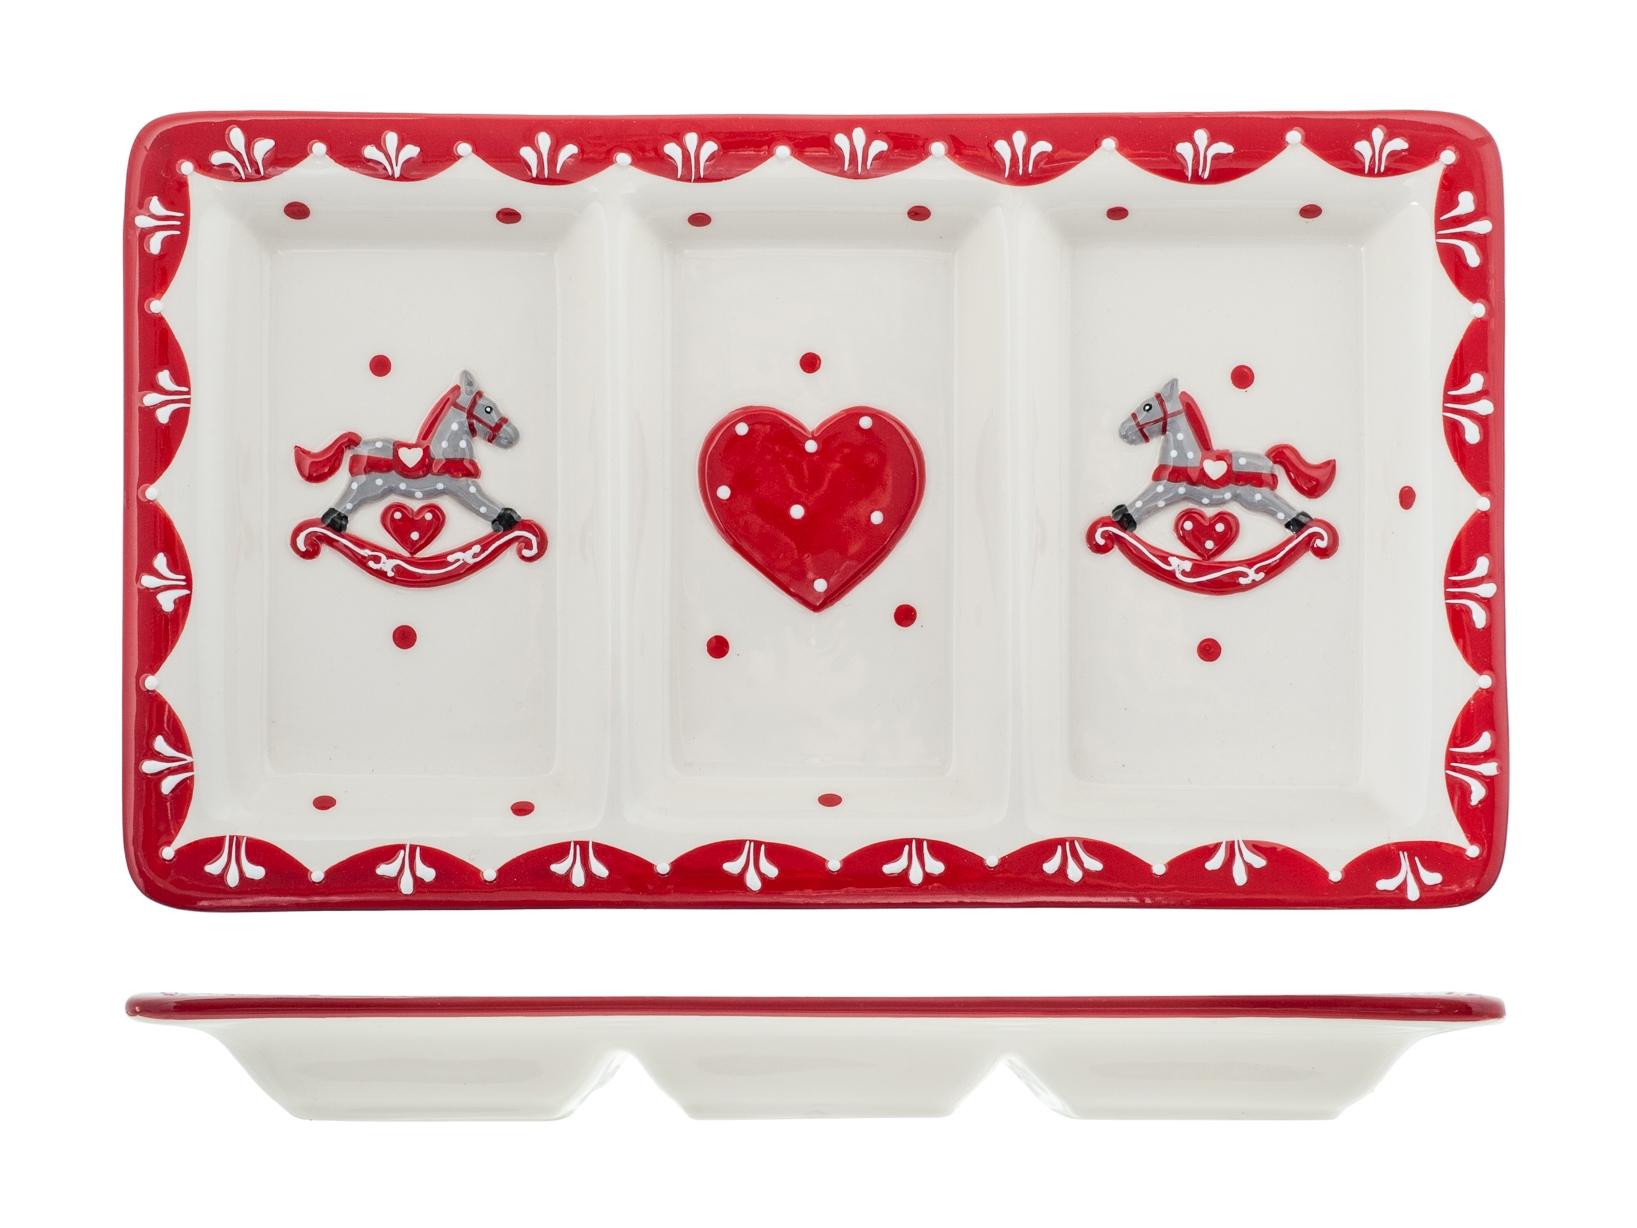 H&h Cavallino Antipastiera Ceramica Rettangolare 3 Posti 29x